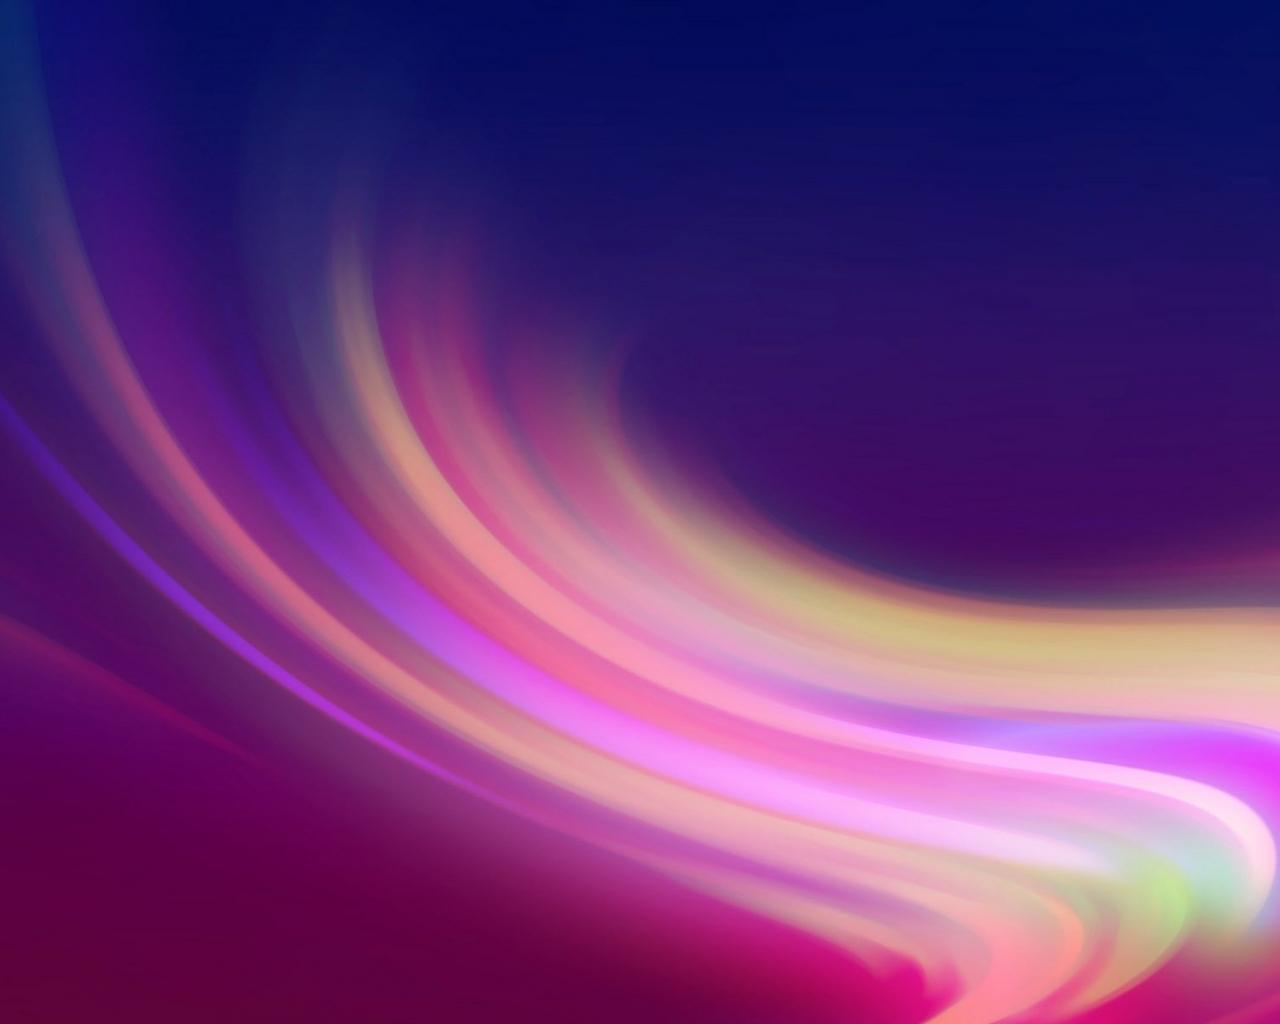 Pink and purple wallpapers wallpapersafari for Pink 3d wallpaper